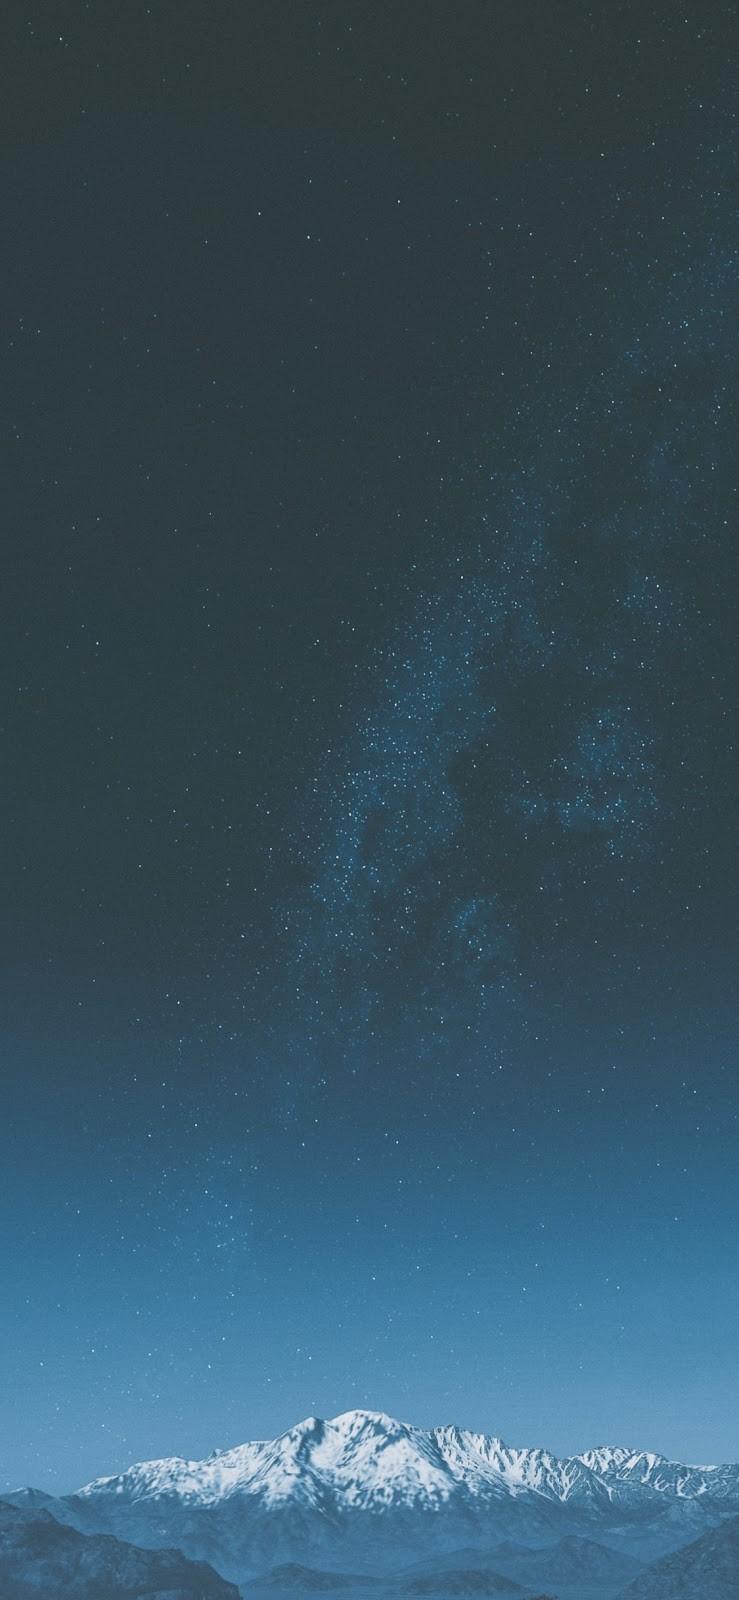 Galaxy S10 10k wallpaper